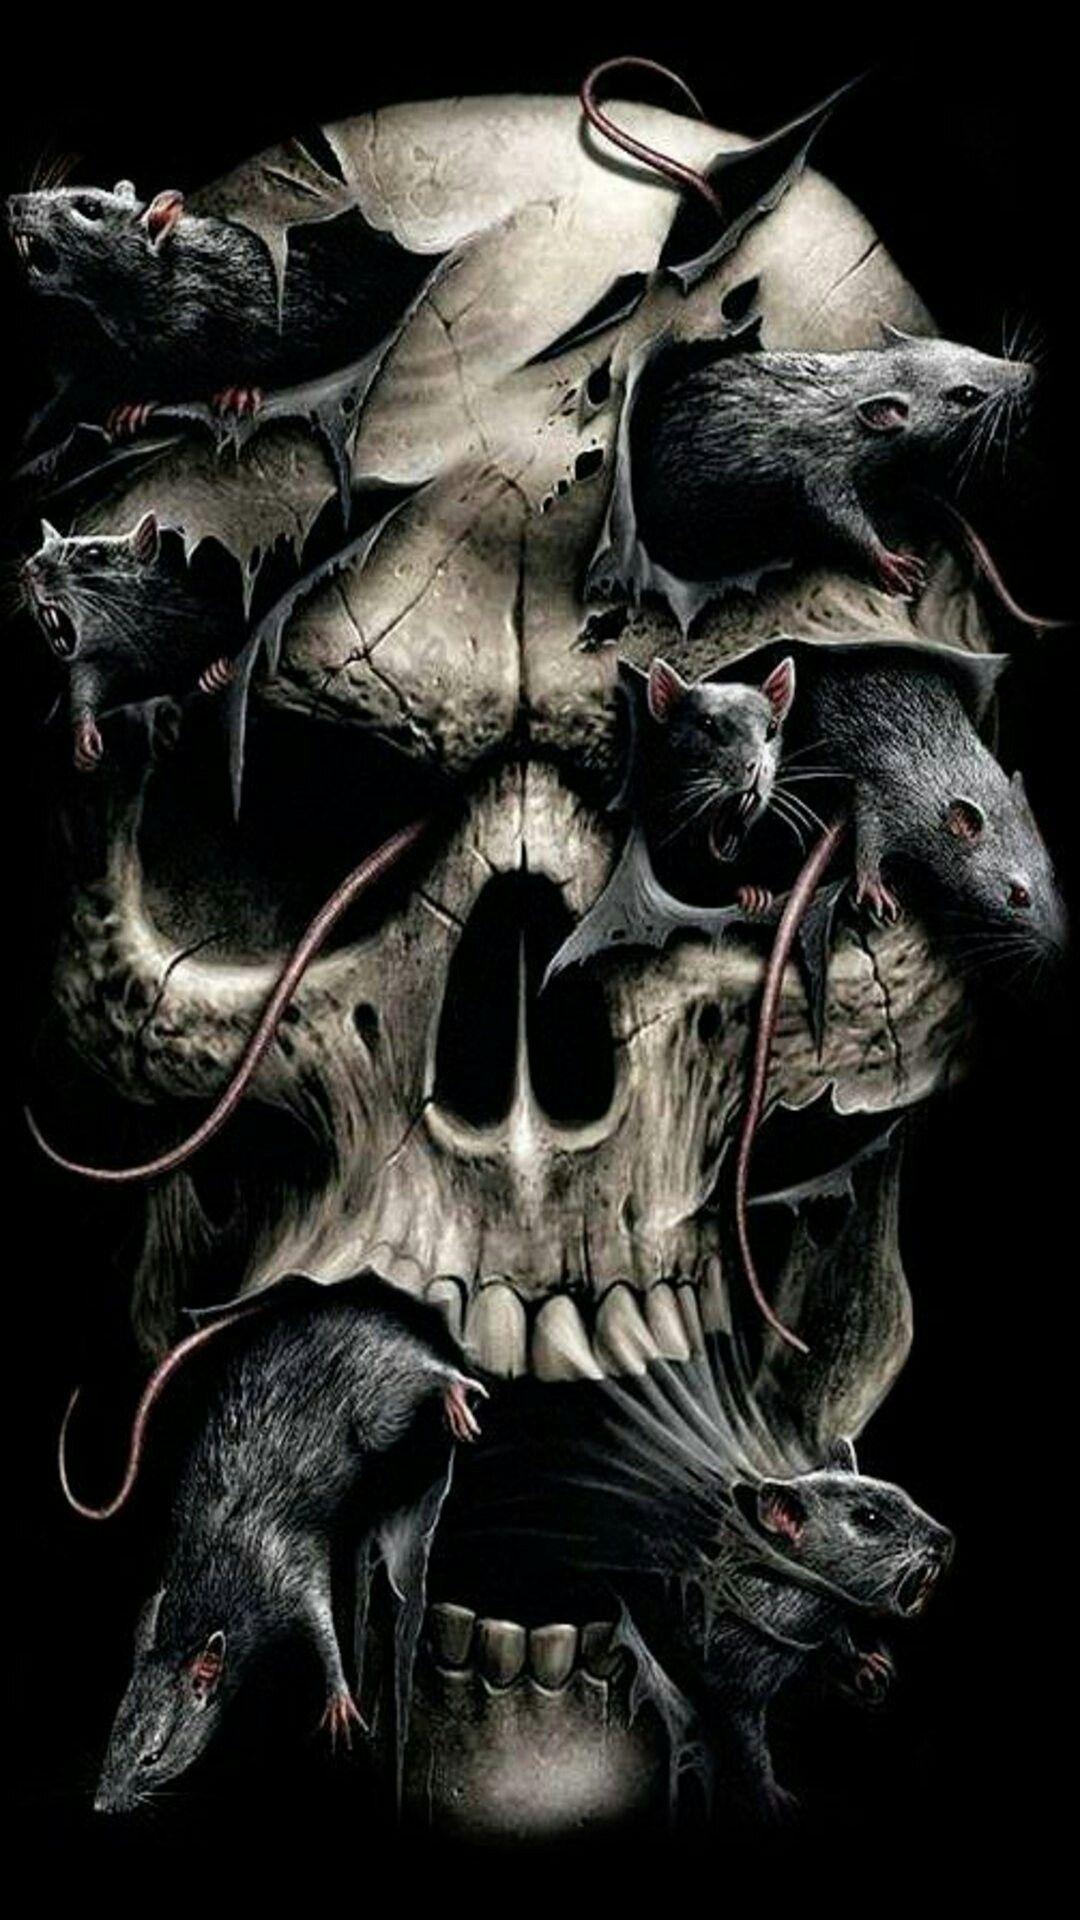 Skull Wallpaper Dark Art Mobile Phones Fantasy Gif Skulls Hd Desktop Backgrounds